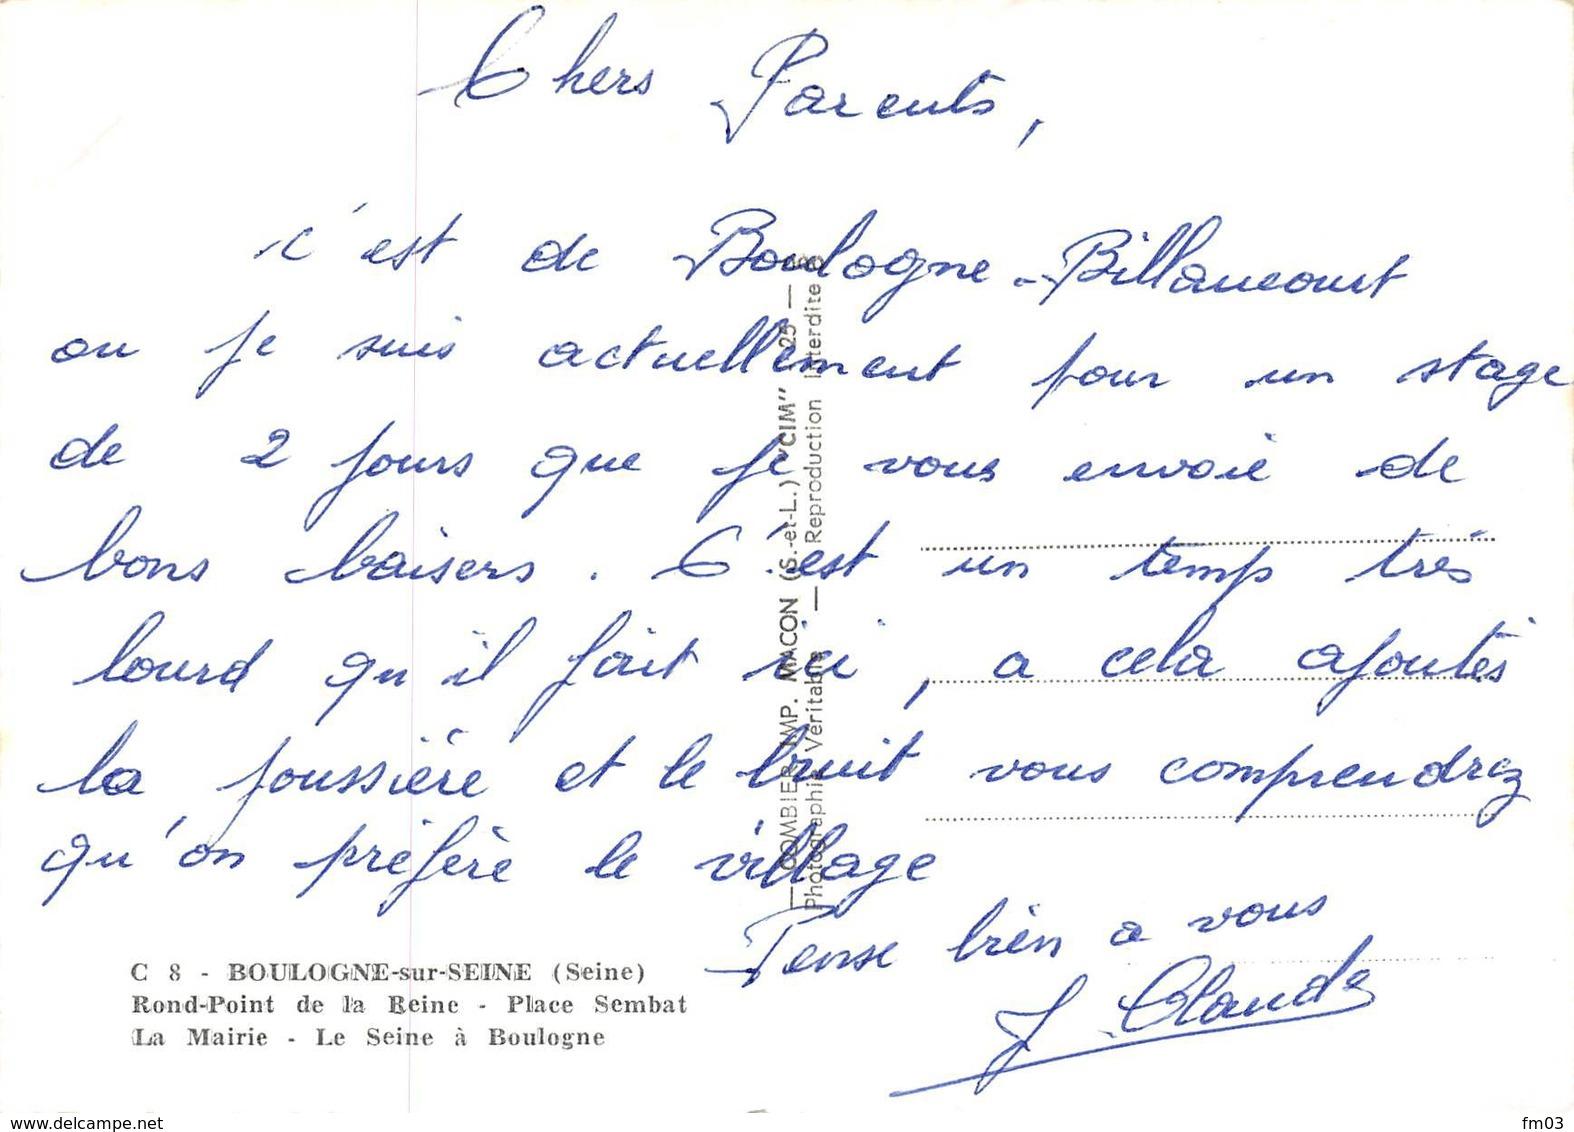 Boulogne Billancourt Renault Dauphine - Boulogne Billancourt